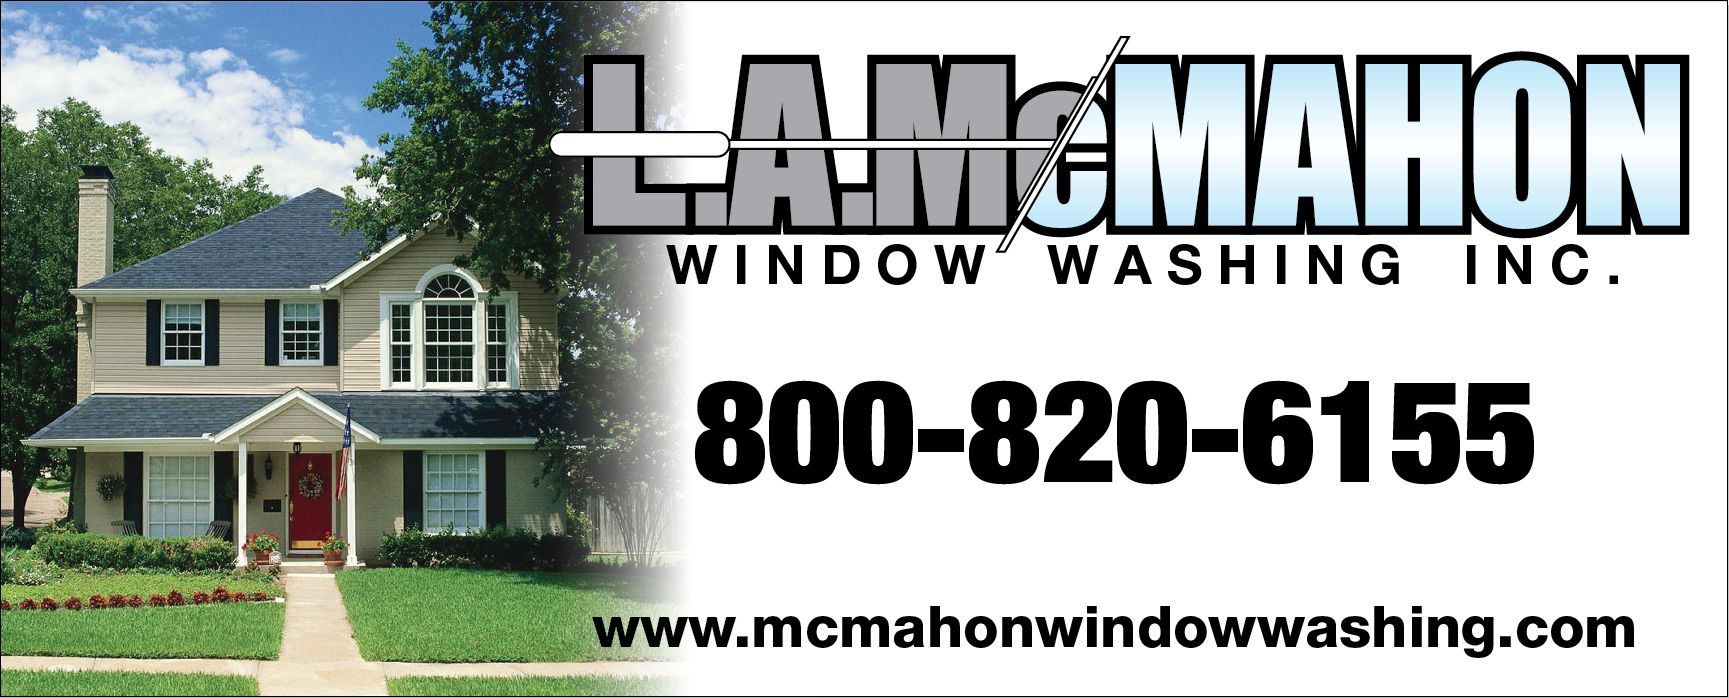 LA McMahon Window Washing U0026 Gutter Cleaning 18008206155 Chicago